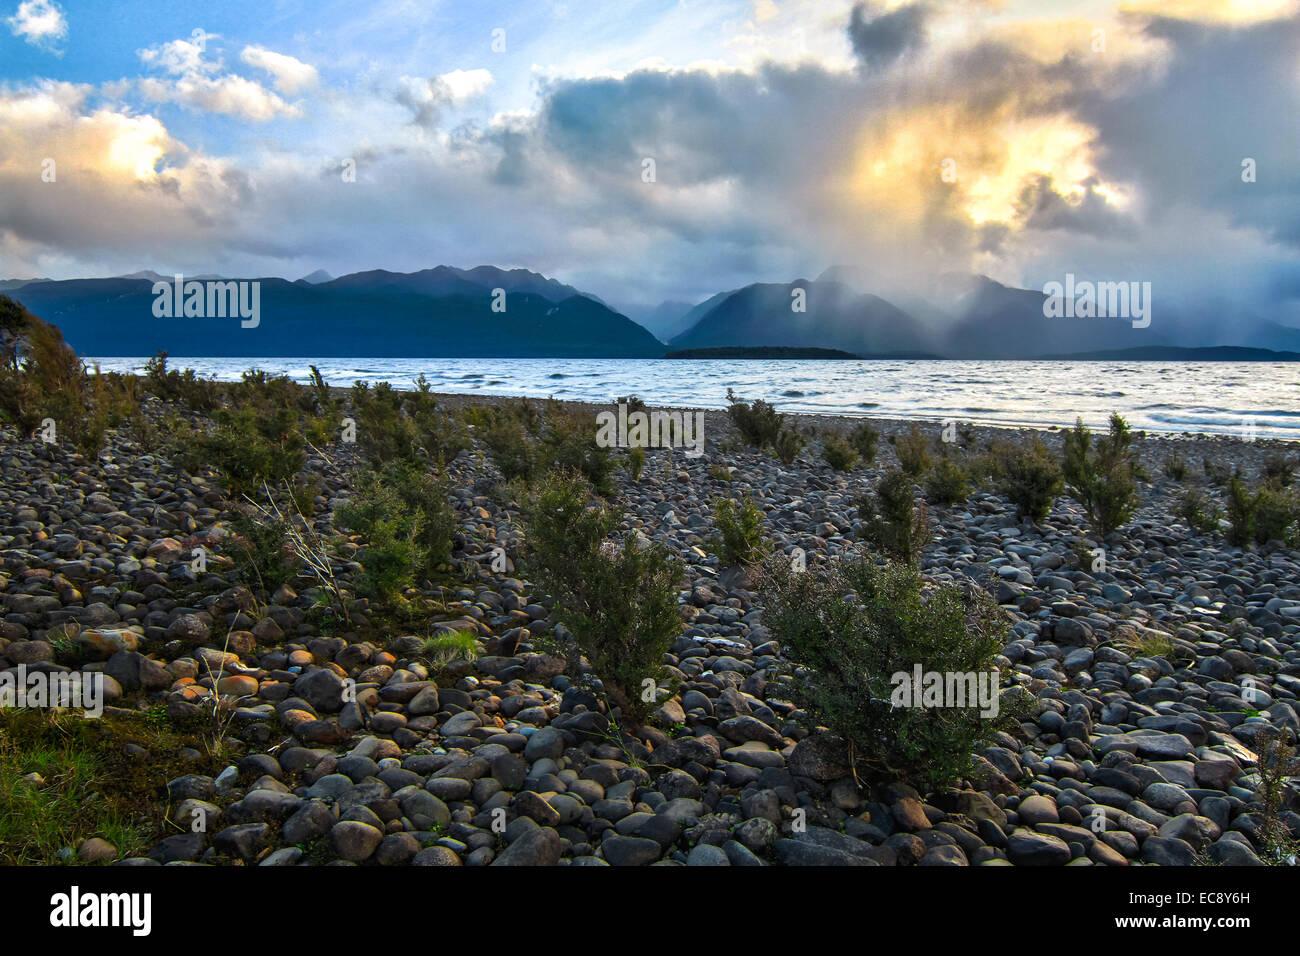 Epic lake scenery on Lake Te Anau, New Zealand - Stock Image